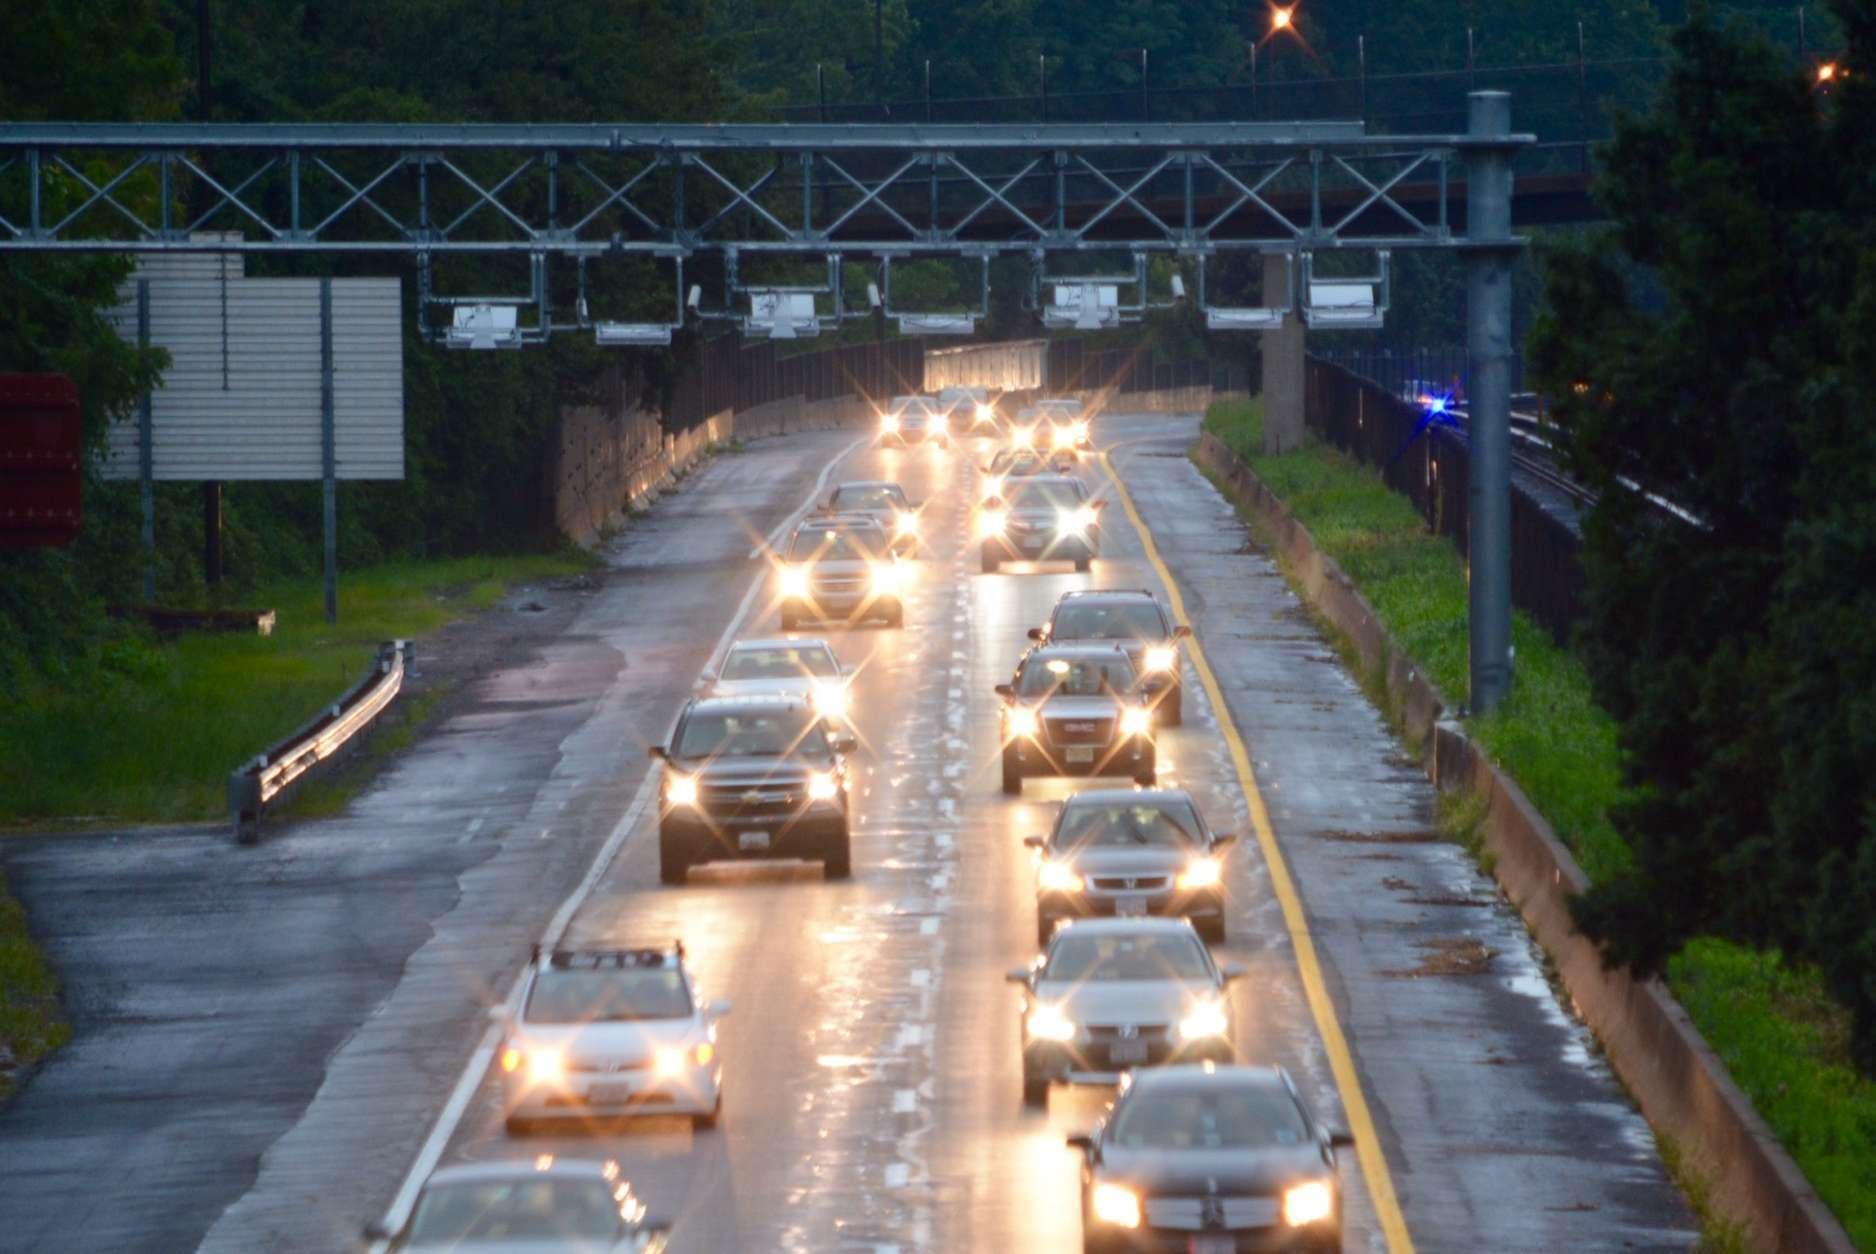 I-66 66 express lanes inside Beltway Arlington traffic toll road